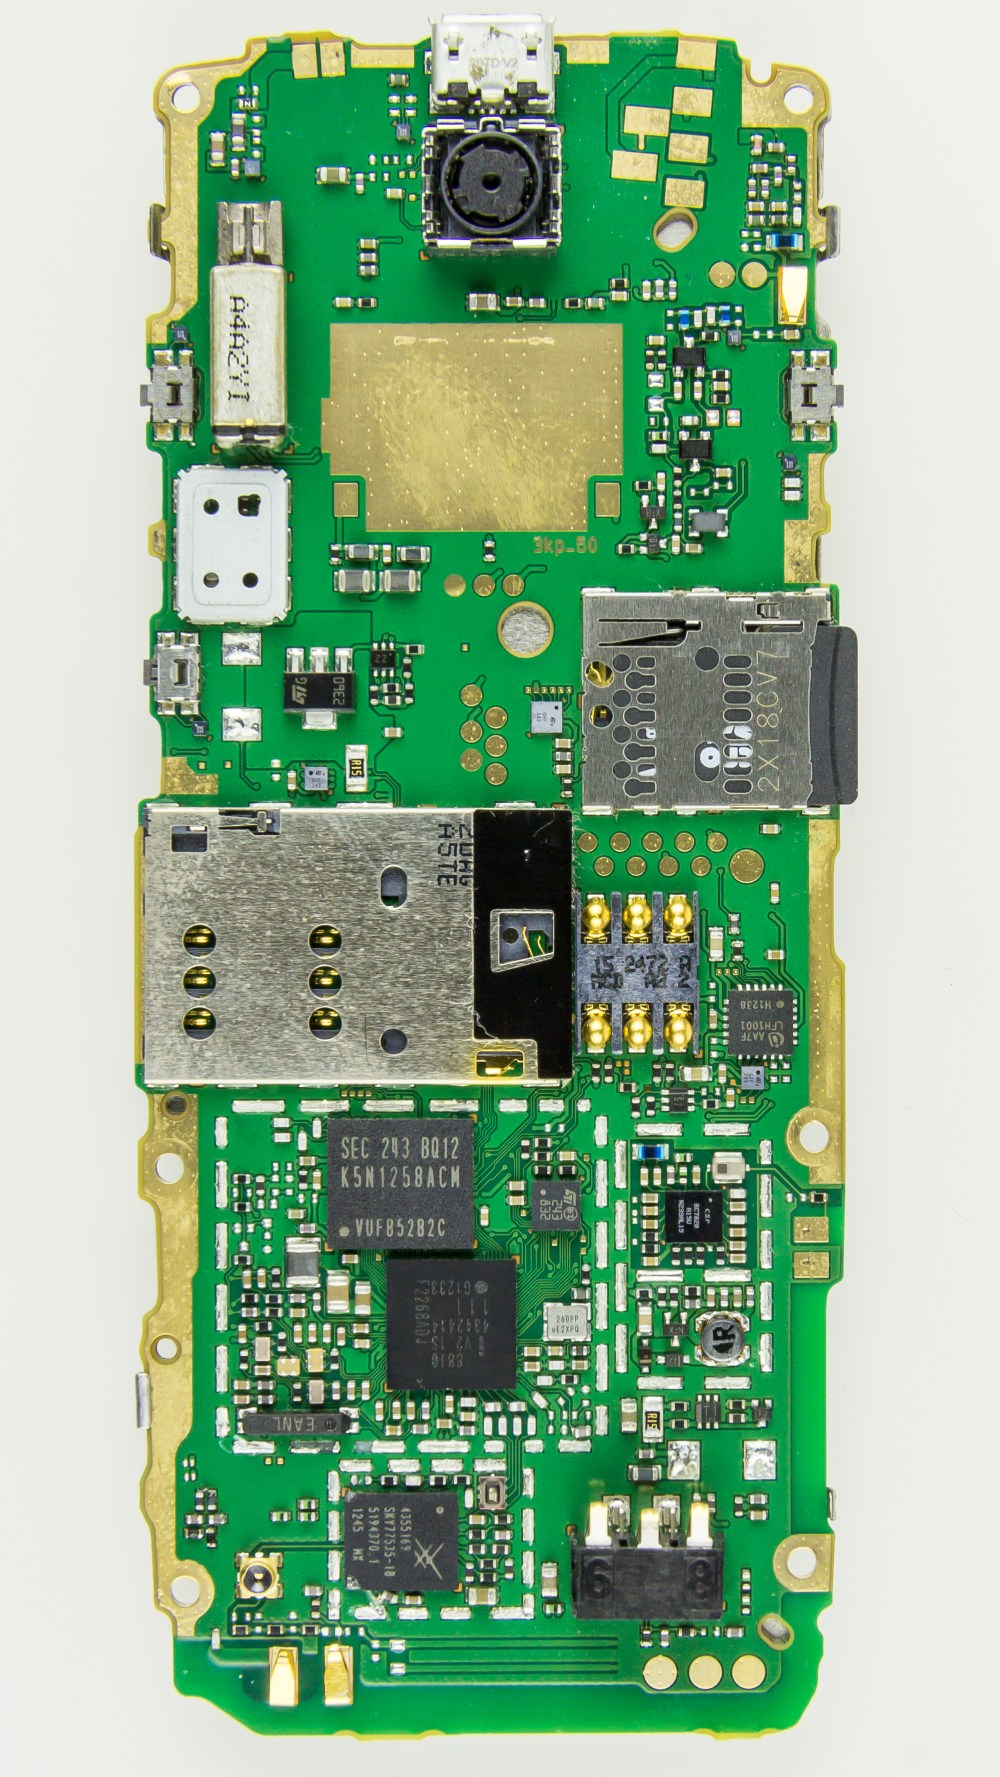 medium resolution of file nokia x2 02 printed circuit board 1141 jpg wikimedia commons circuit diagram of nokia x2 02